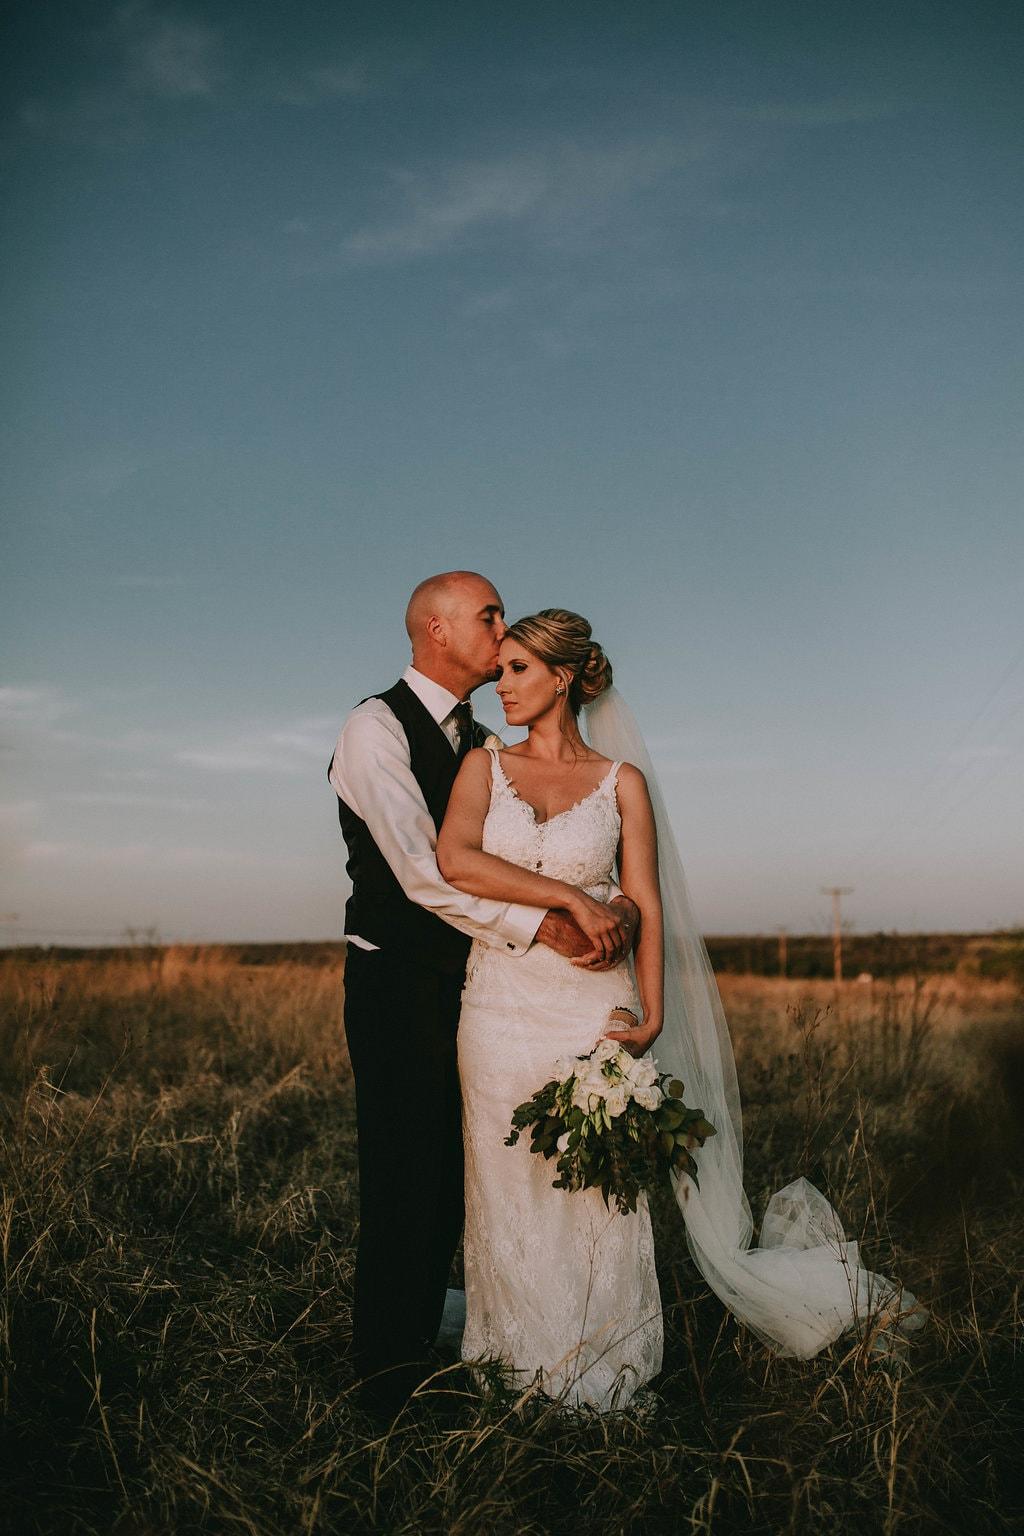 Sentimental Rustic Wedding | Image: Jessica J Photography